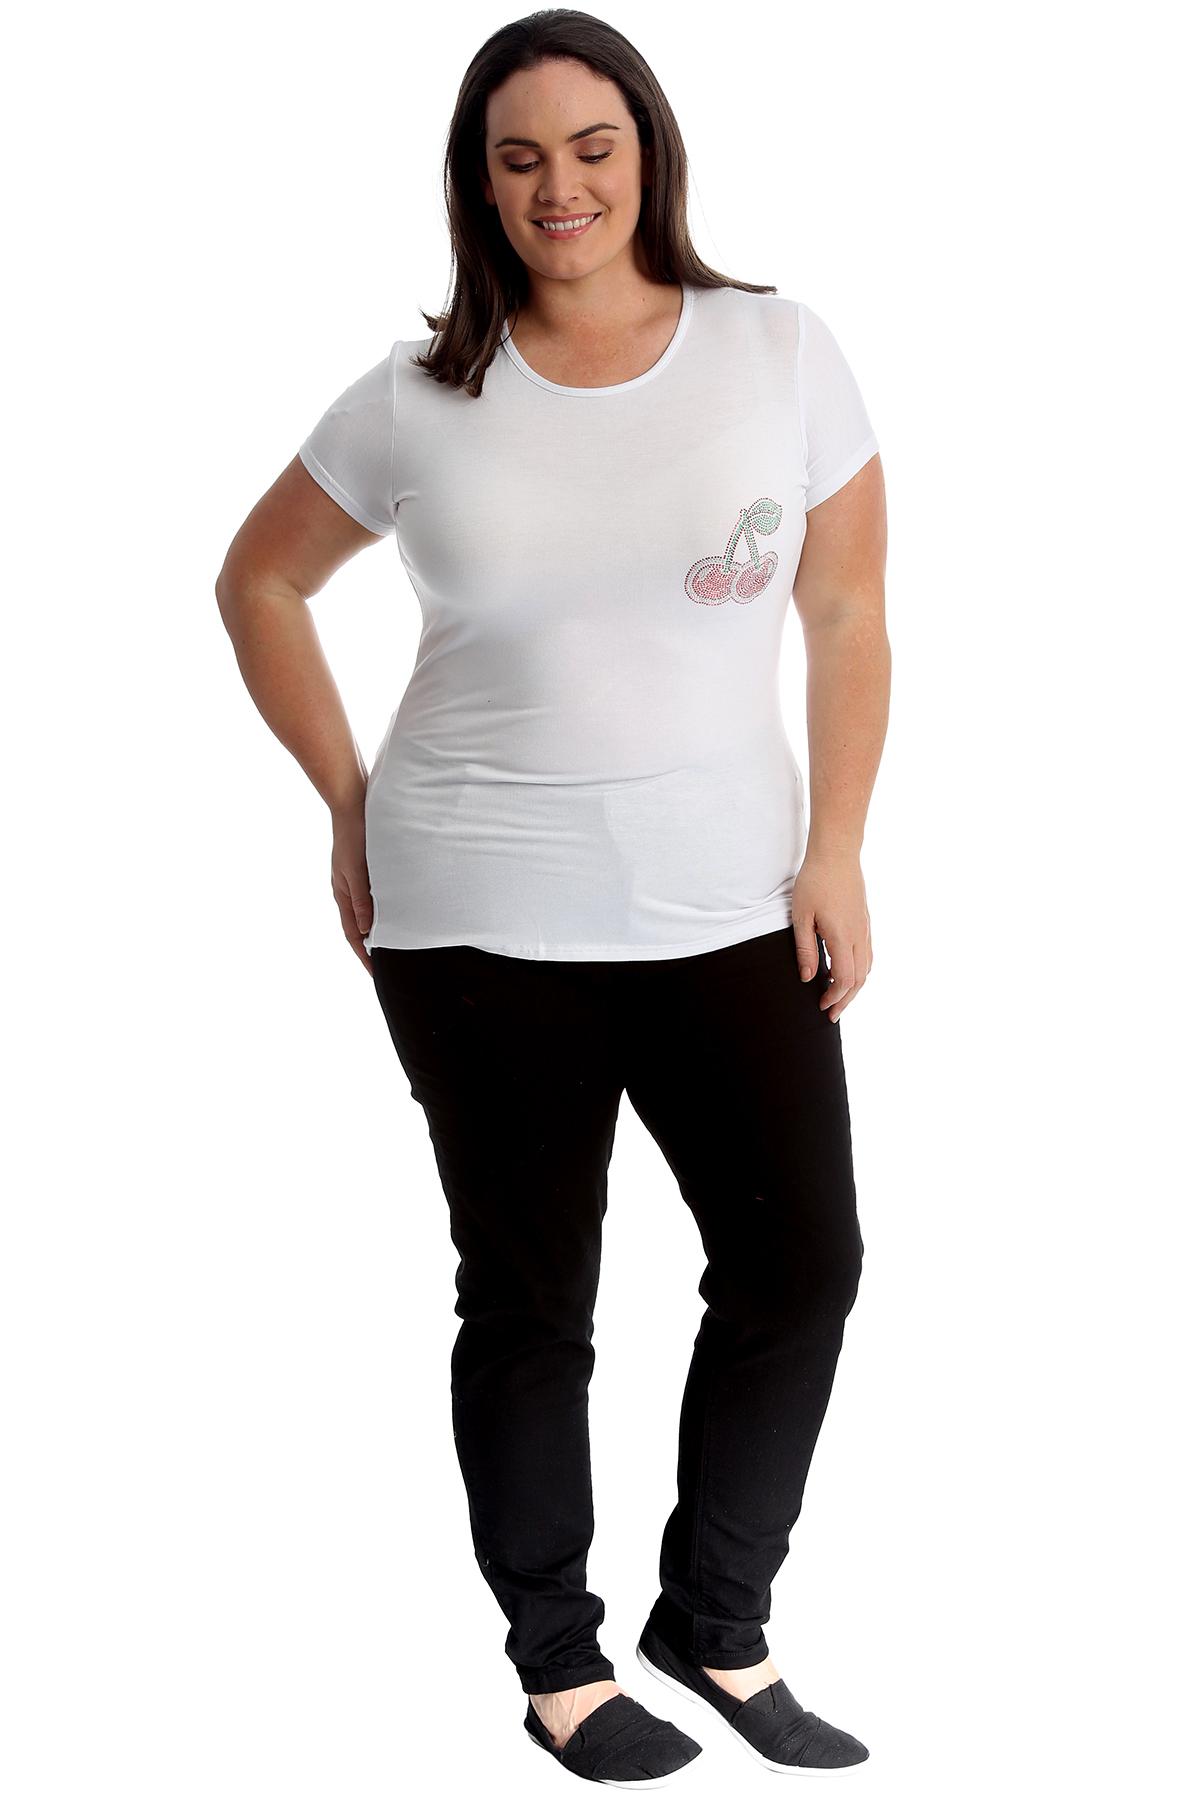 New-Womens-Plus-Size-Top-Ladies-Cherry-Rhinestone-T-Shirt-Soft-Stud-Shiny-Hip thumbnail 17